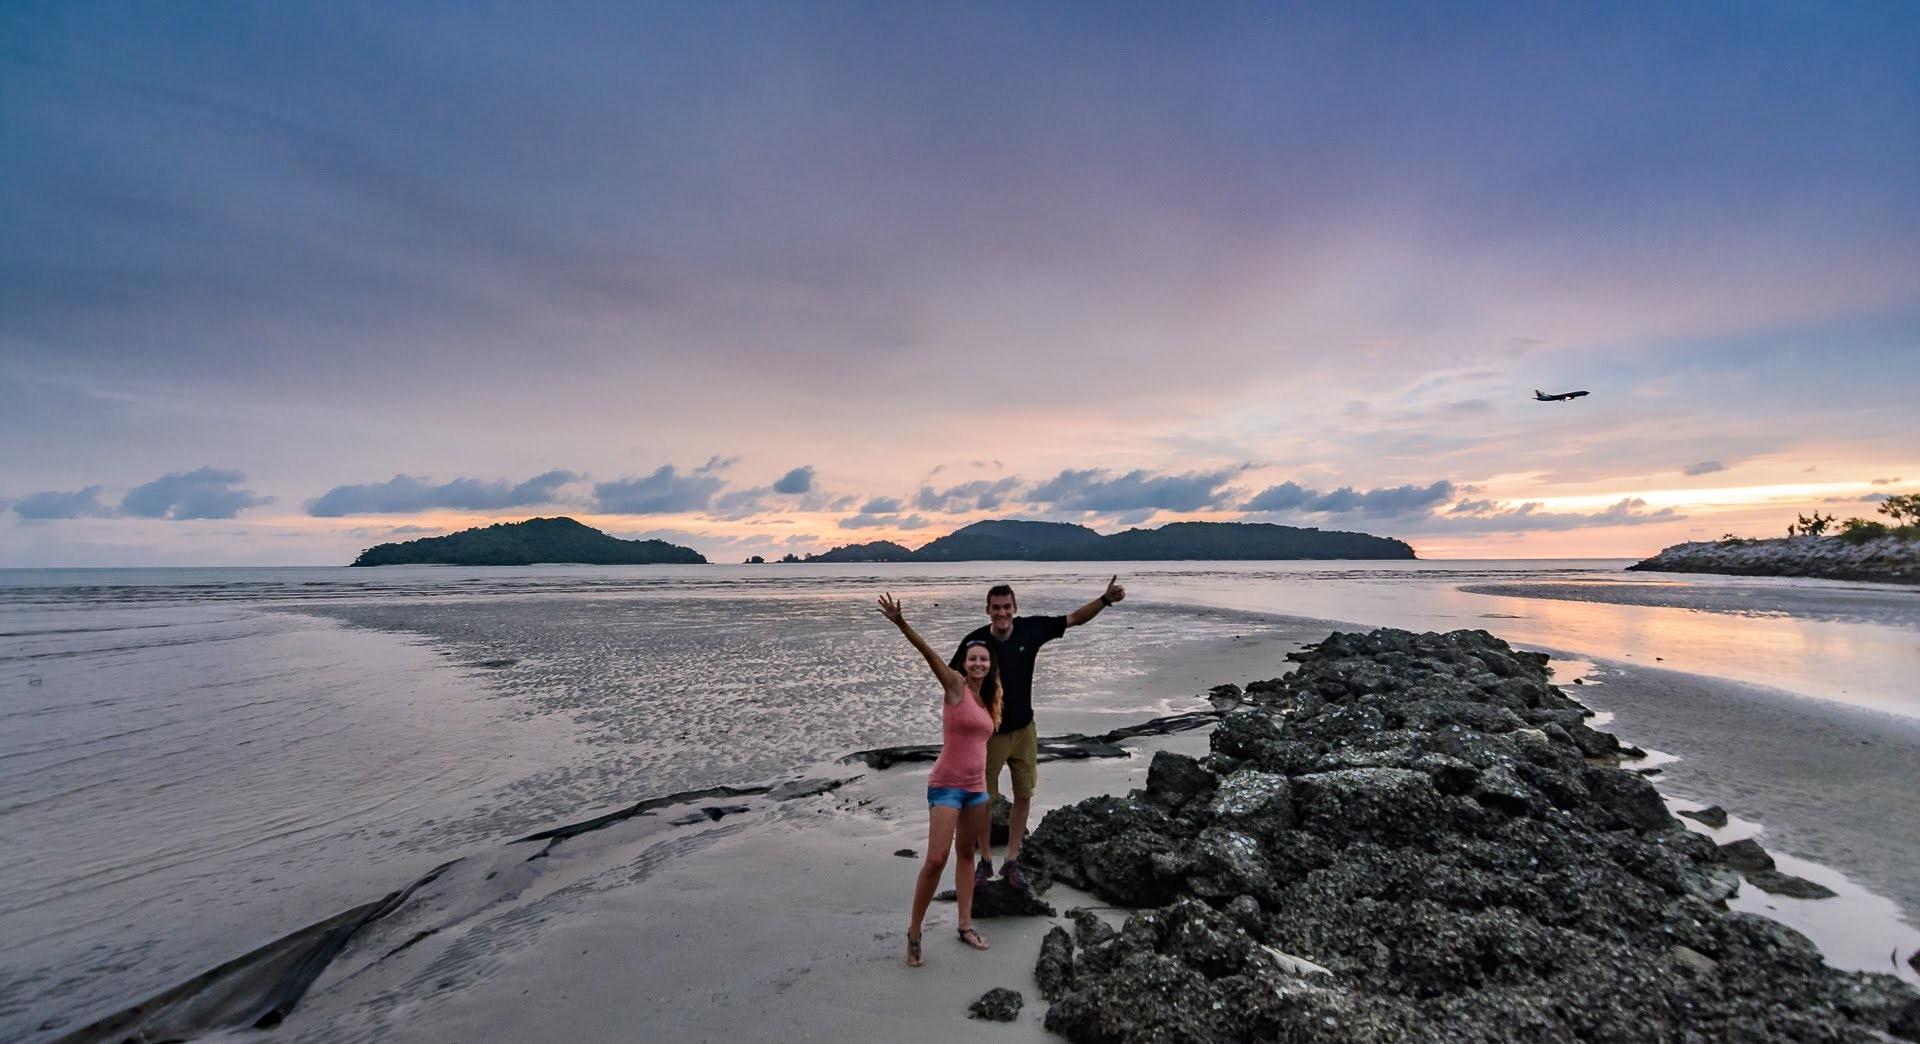 Ostrov Langkawi - Malajsie cestopis, Martin Šístek